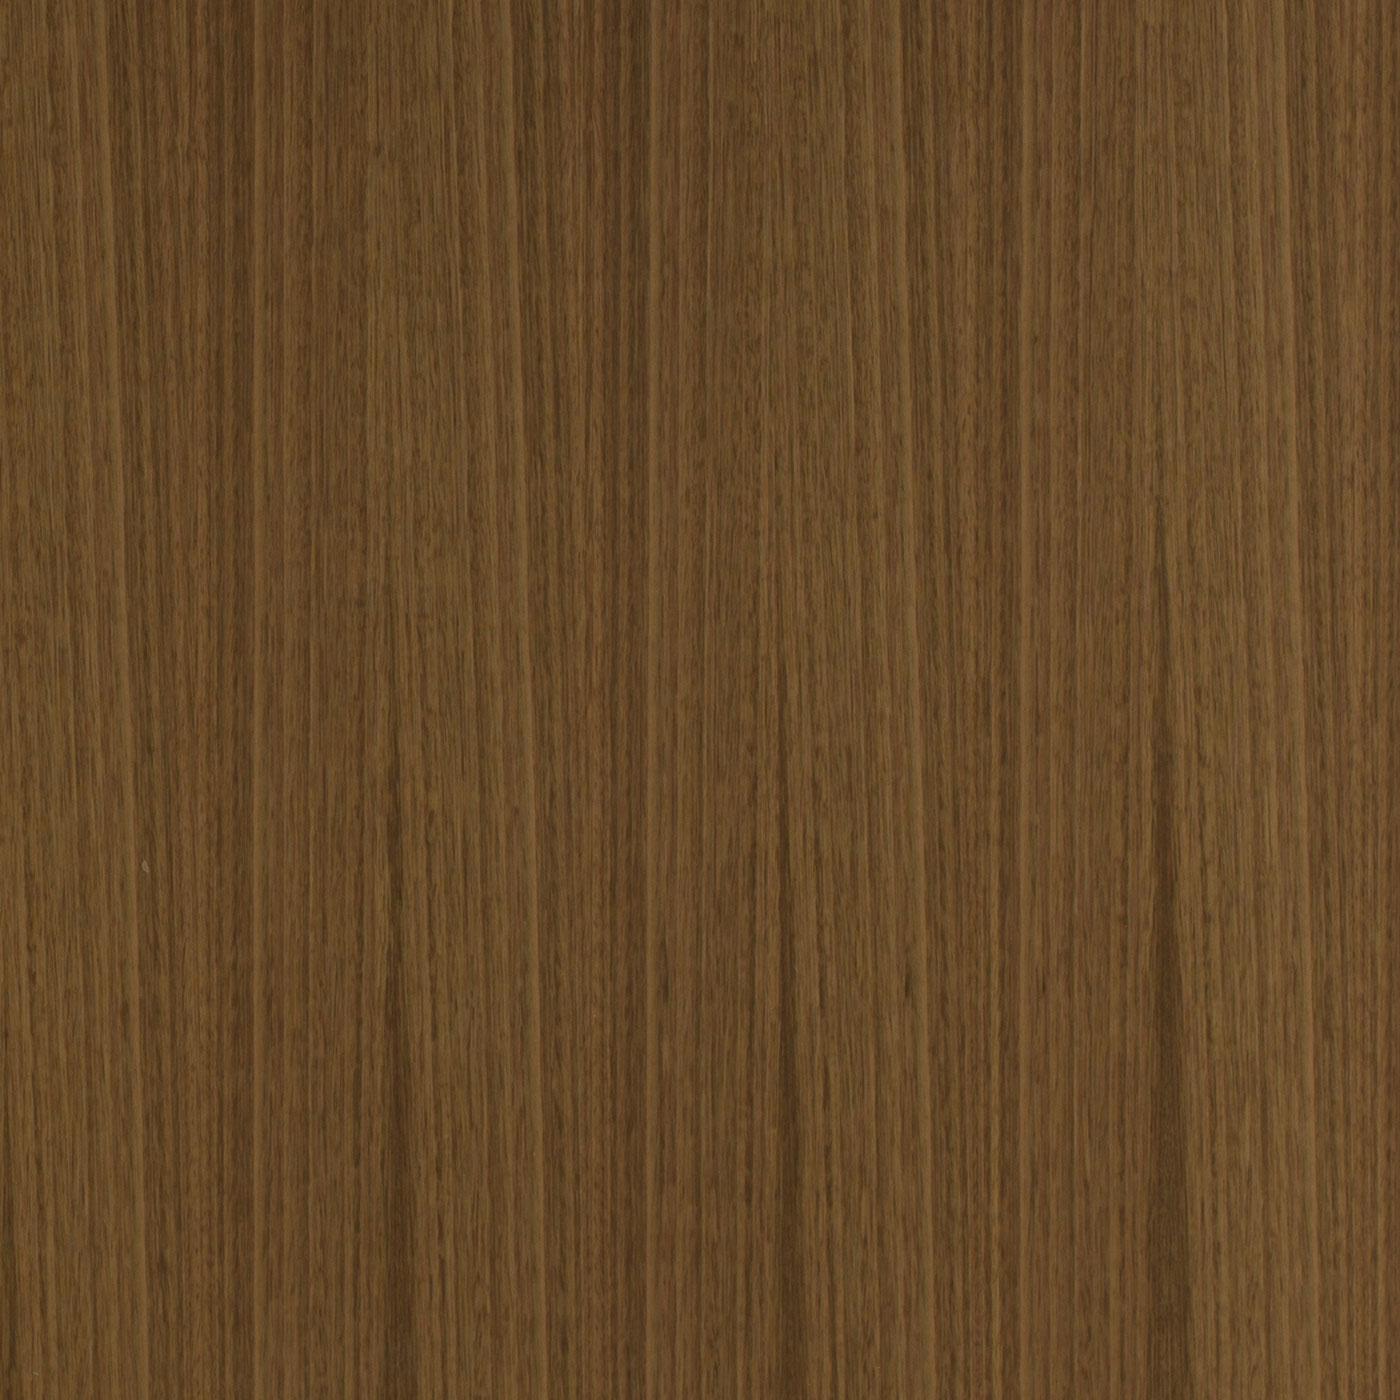 988 Austrailian Eucalyptus - Lamin-Art